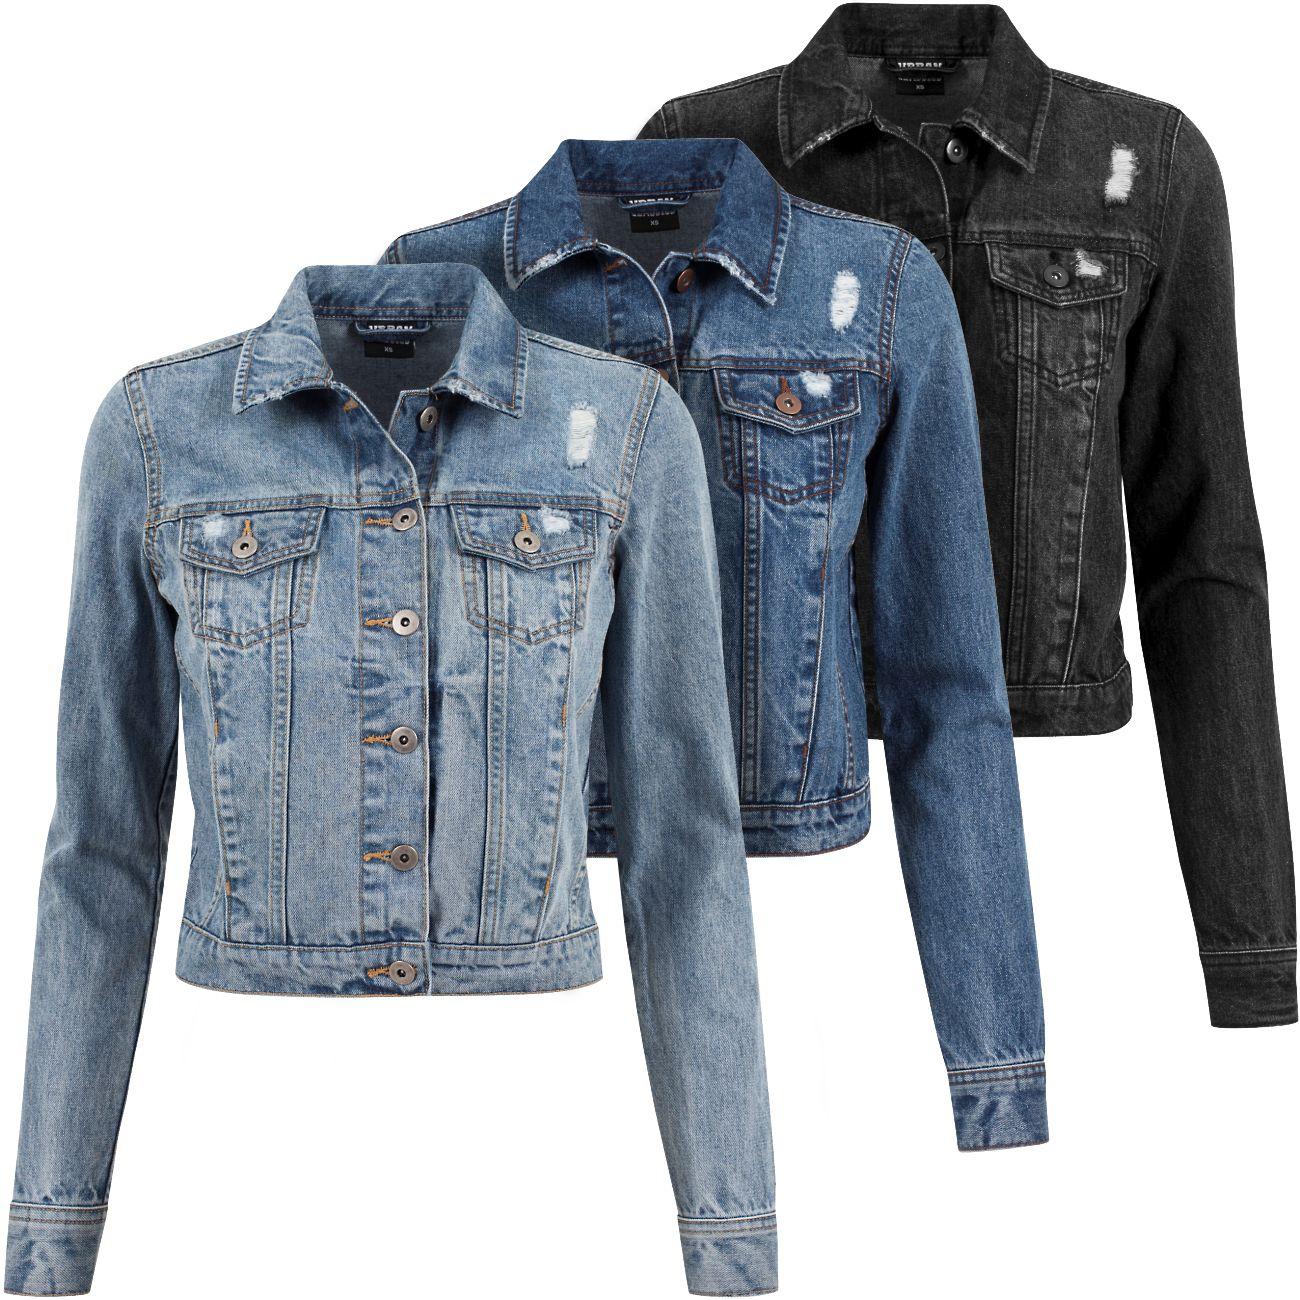 urban classics damen jeans jacke tb1542 jeansjacke sommer. Black Bedroom Furniture Sets. Home Design Ideas